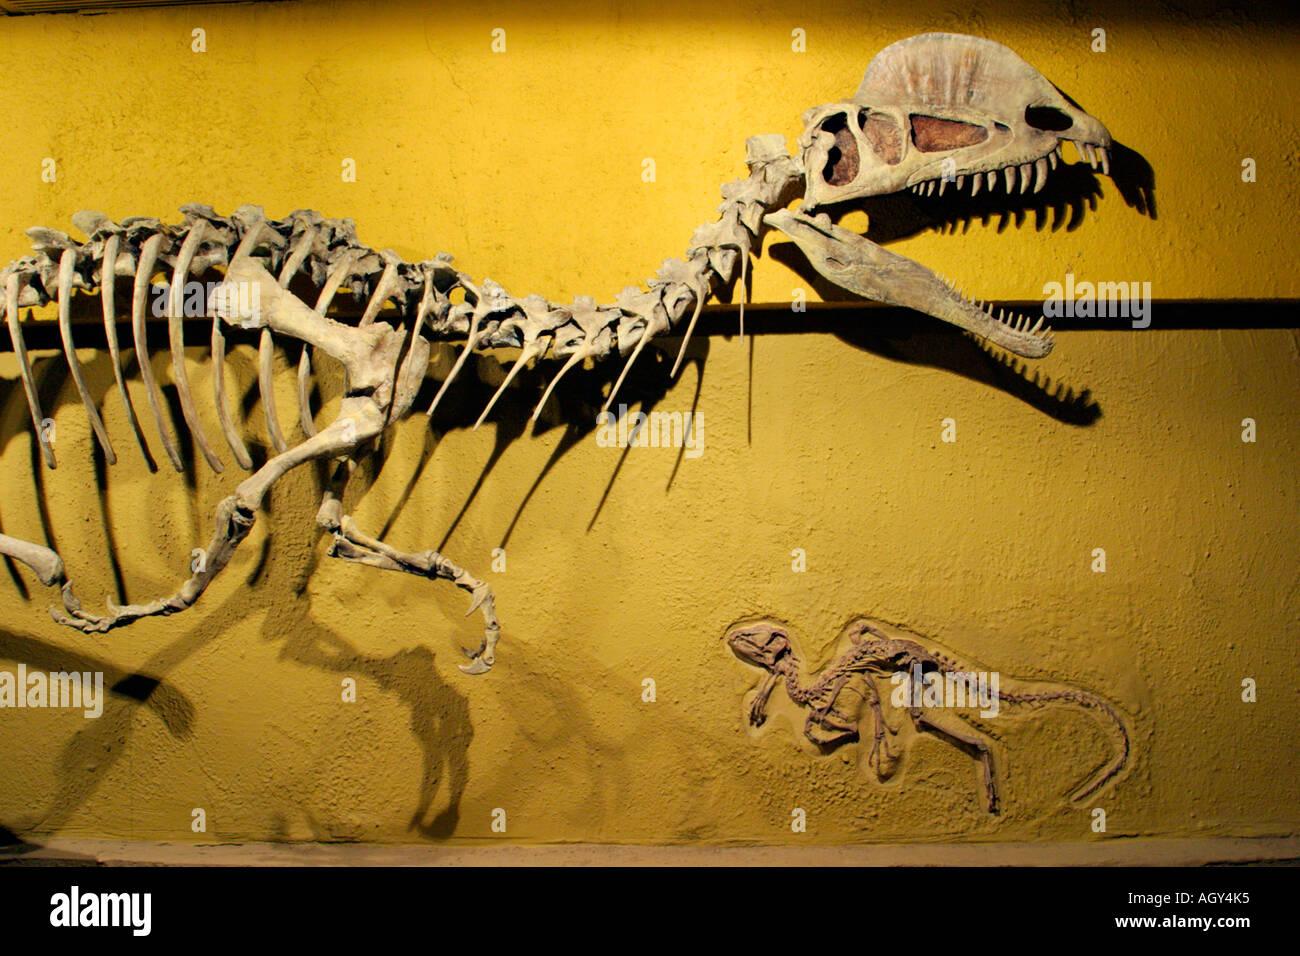 Structure du squelette d'Dilophsaurus Heterodontisaurus et dinosaures-Royal Tyrrell Museum, Drumheller, Alberta, Canada. Photo Stock